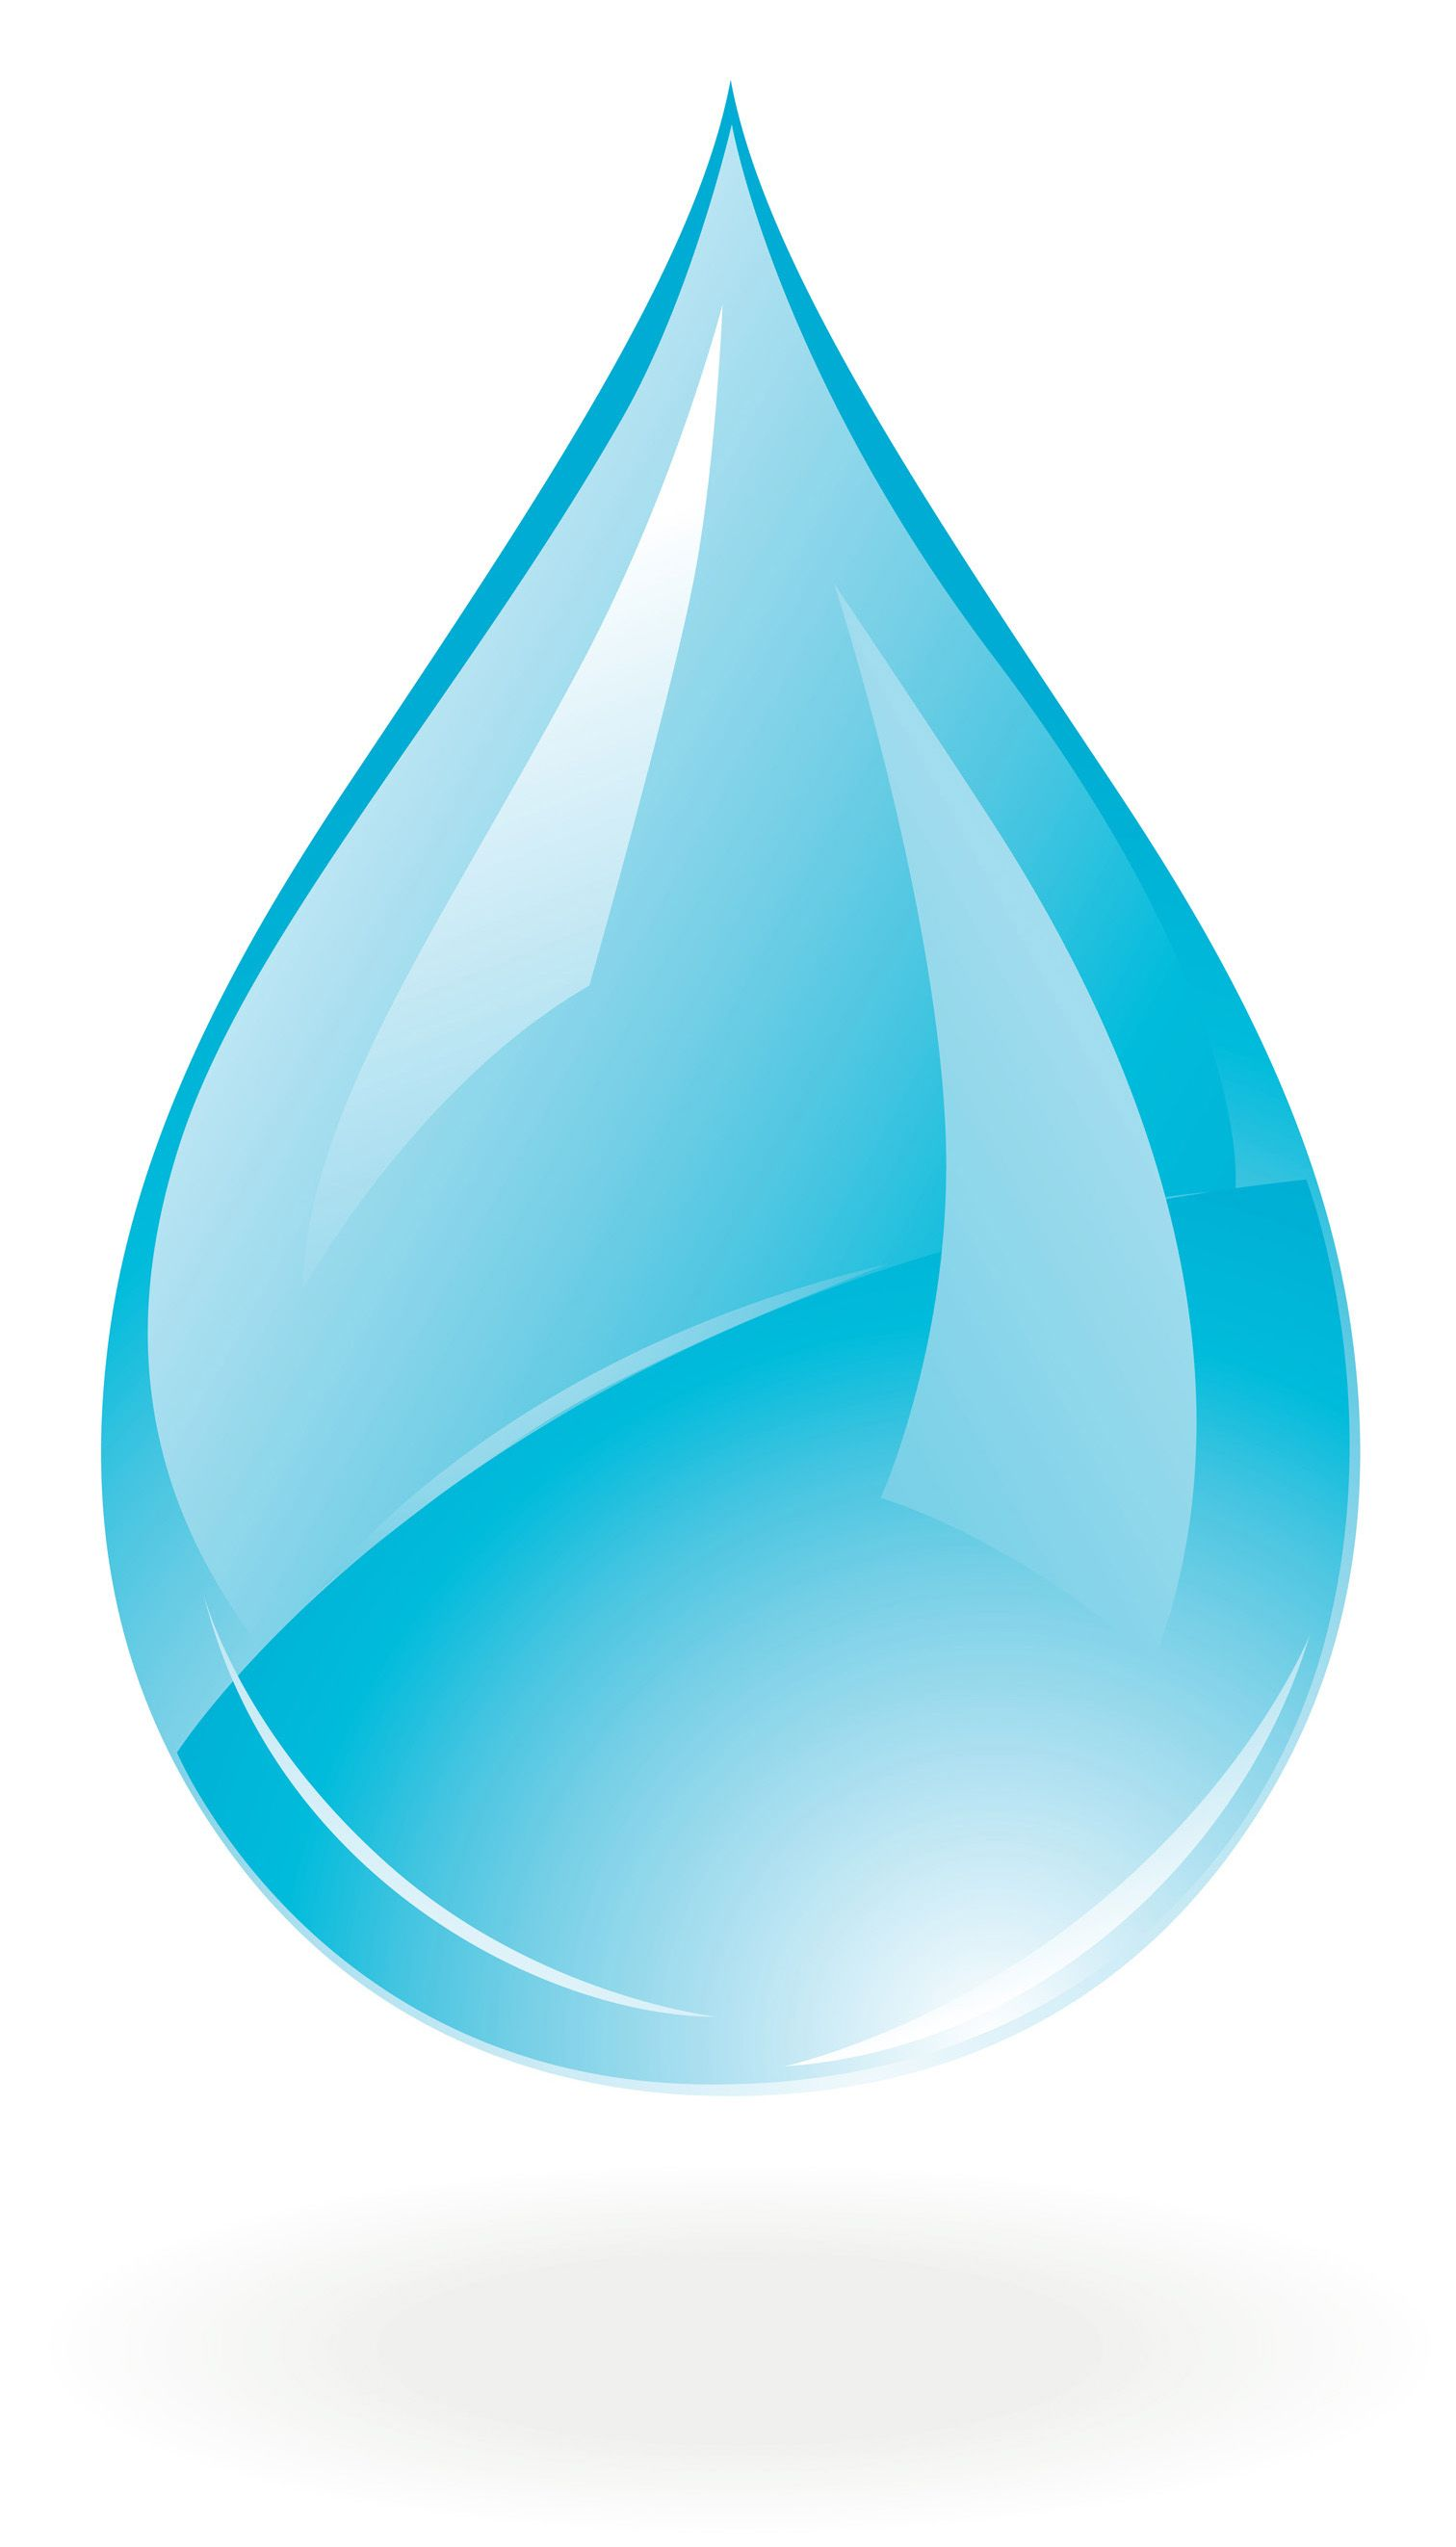 water drop psd clipart planning